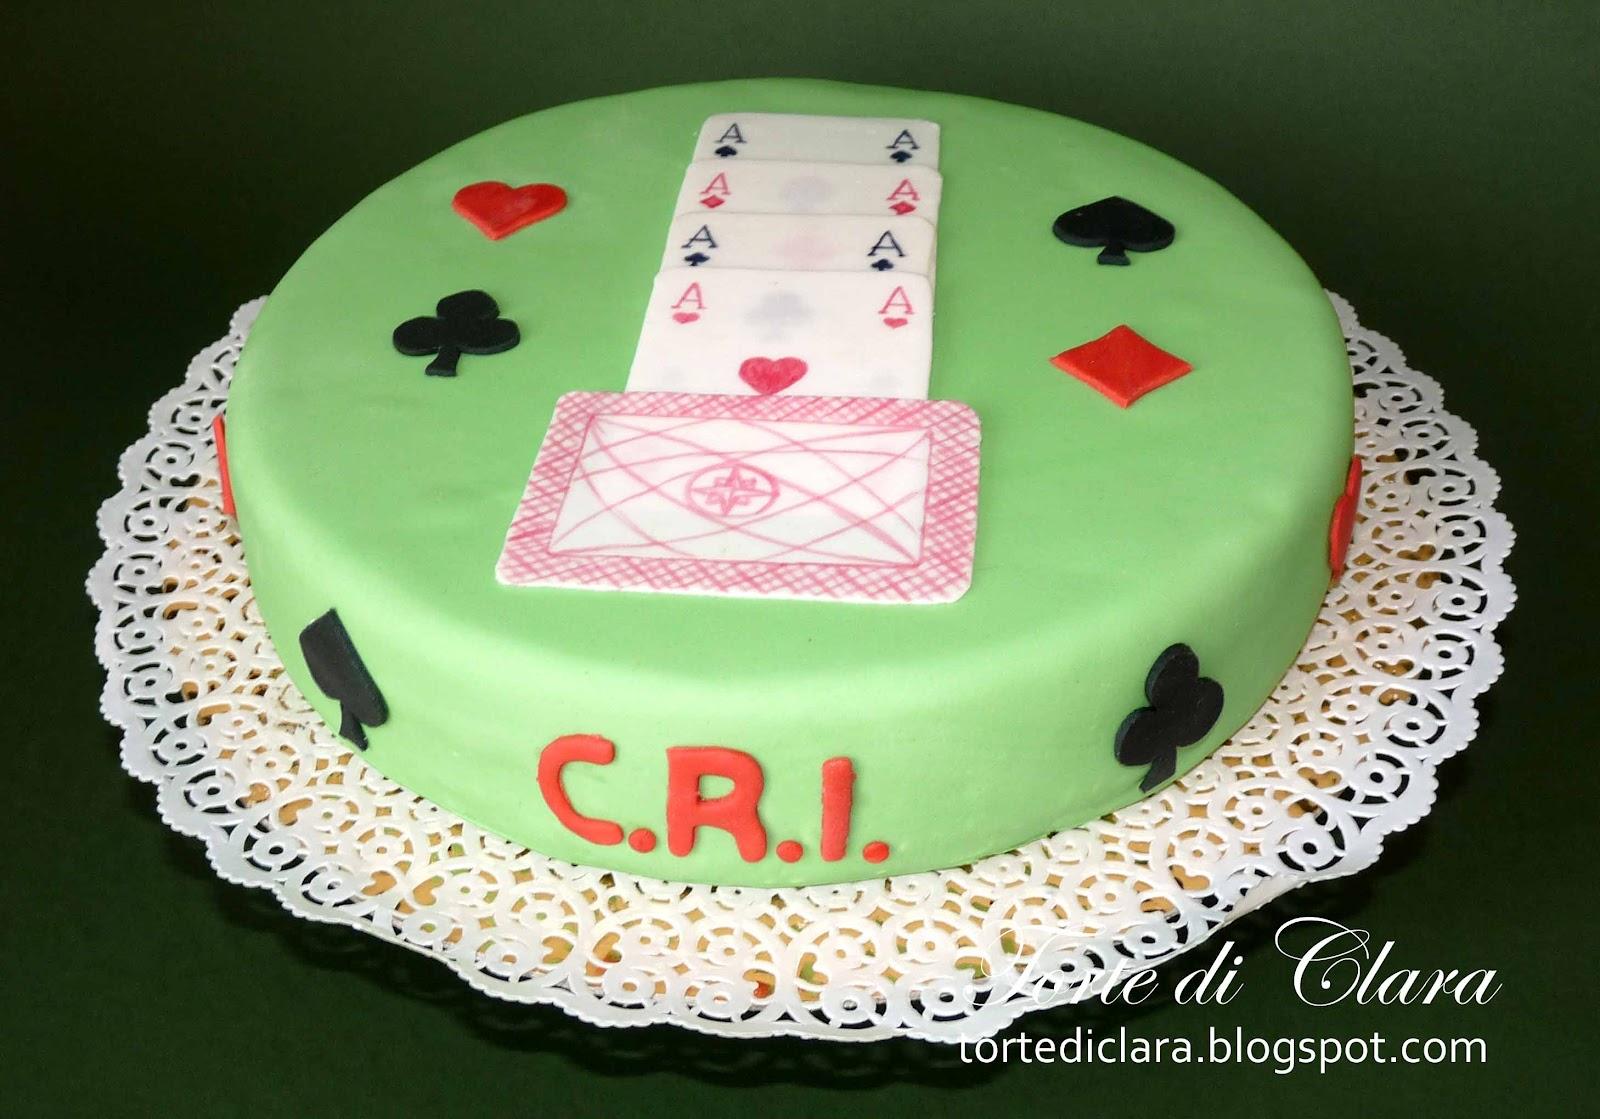 Cake Design Roma : Pin Cake Design Roma Nettuno Latina Torte Decorate Ricette ...